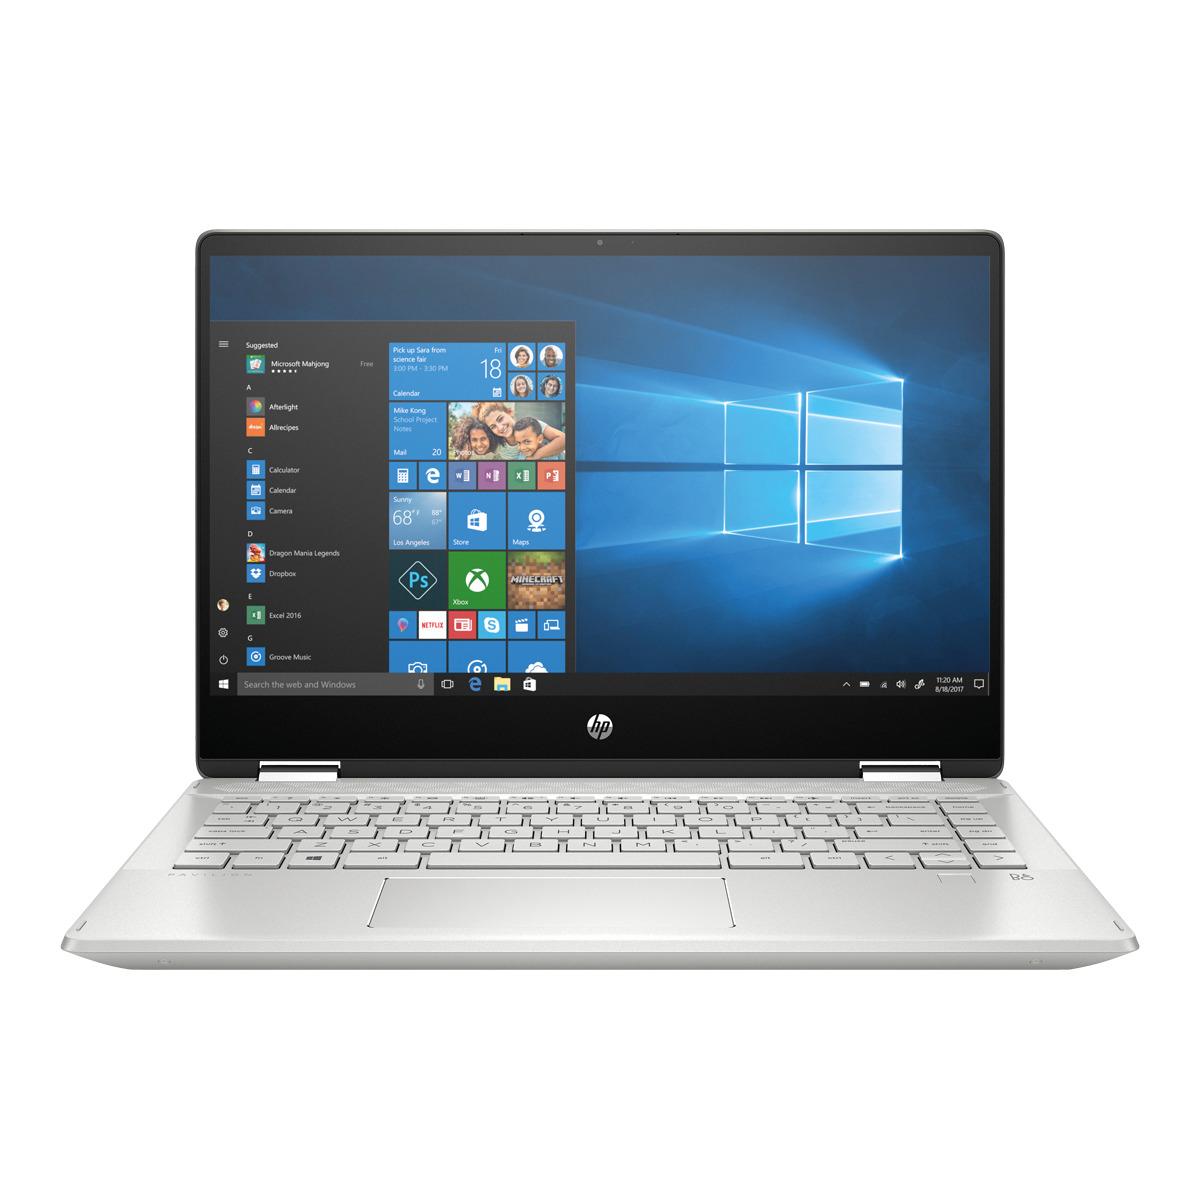 Convertible 2 en 1 HP Pavilion 14-dh1005ns x360, i7, 8 GB, 512 GB SSD, GeForce MX 250 2GB